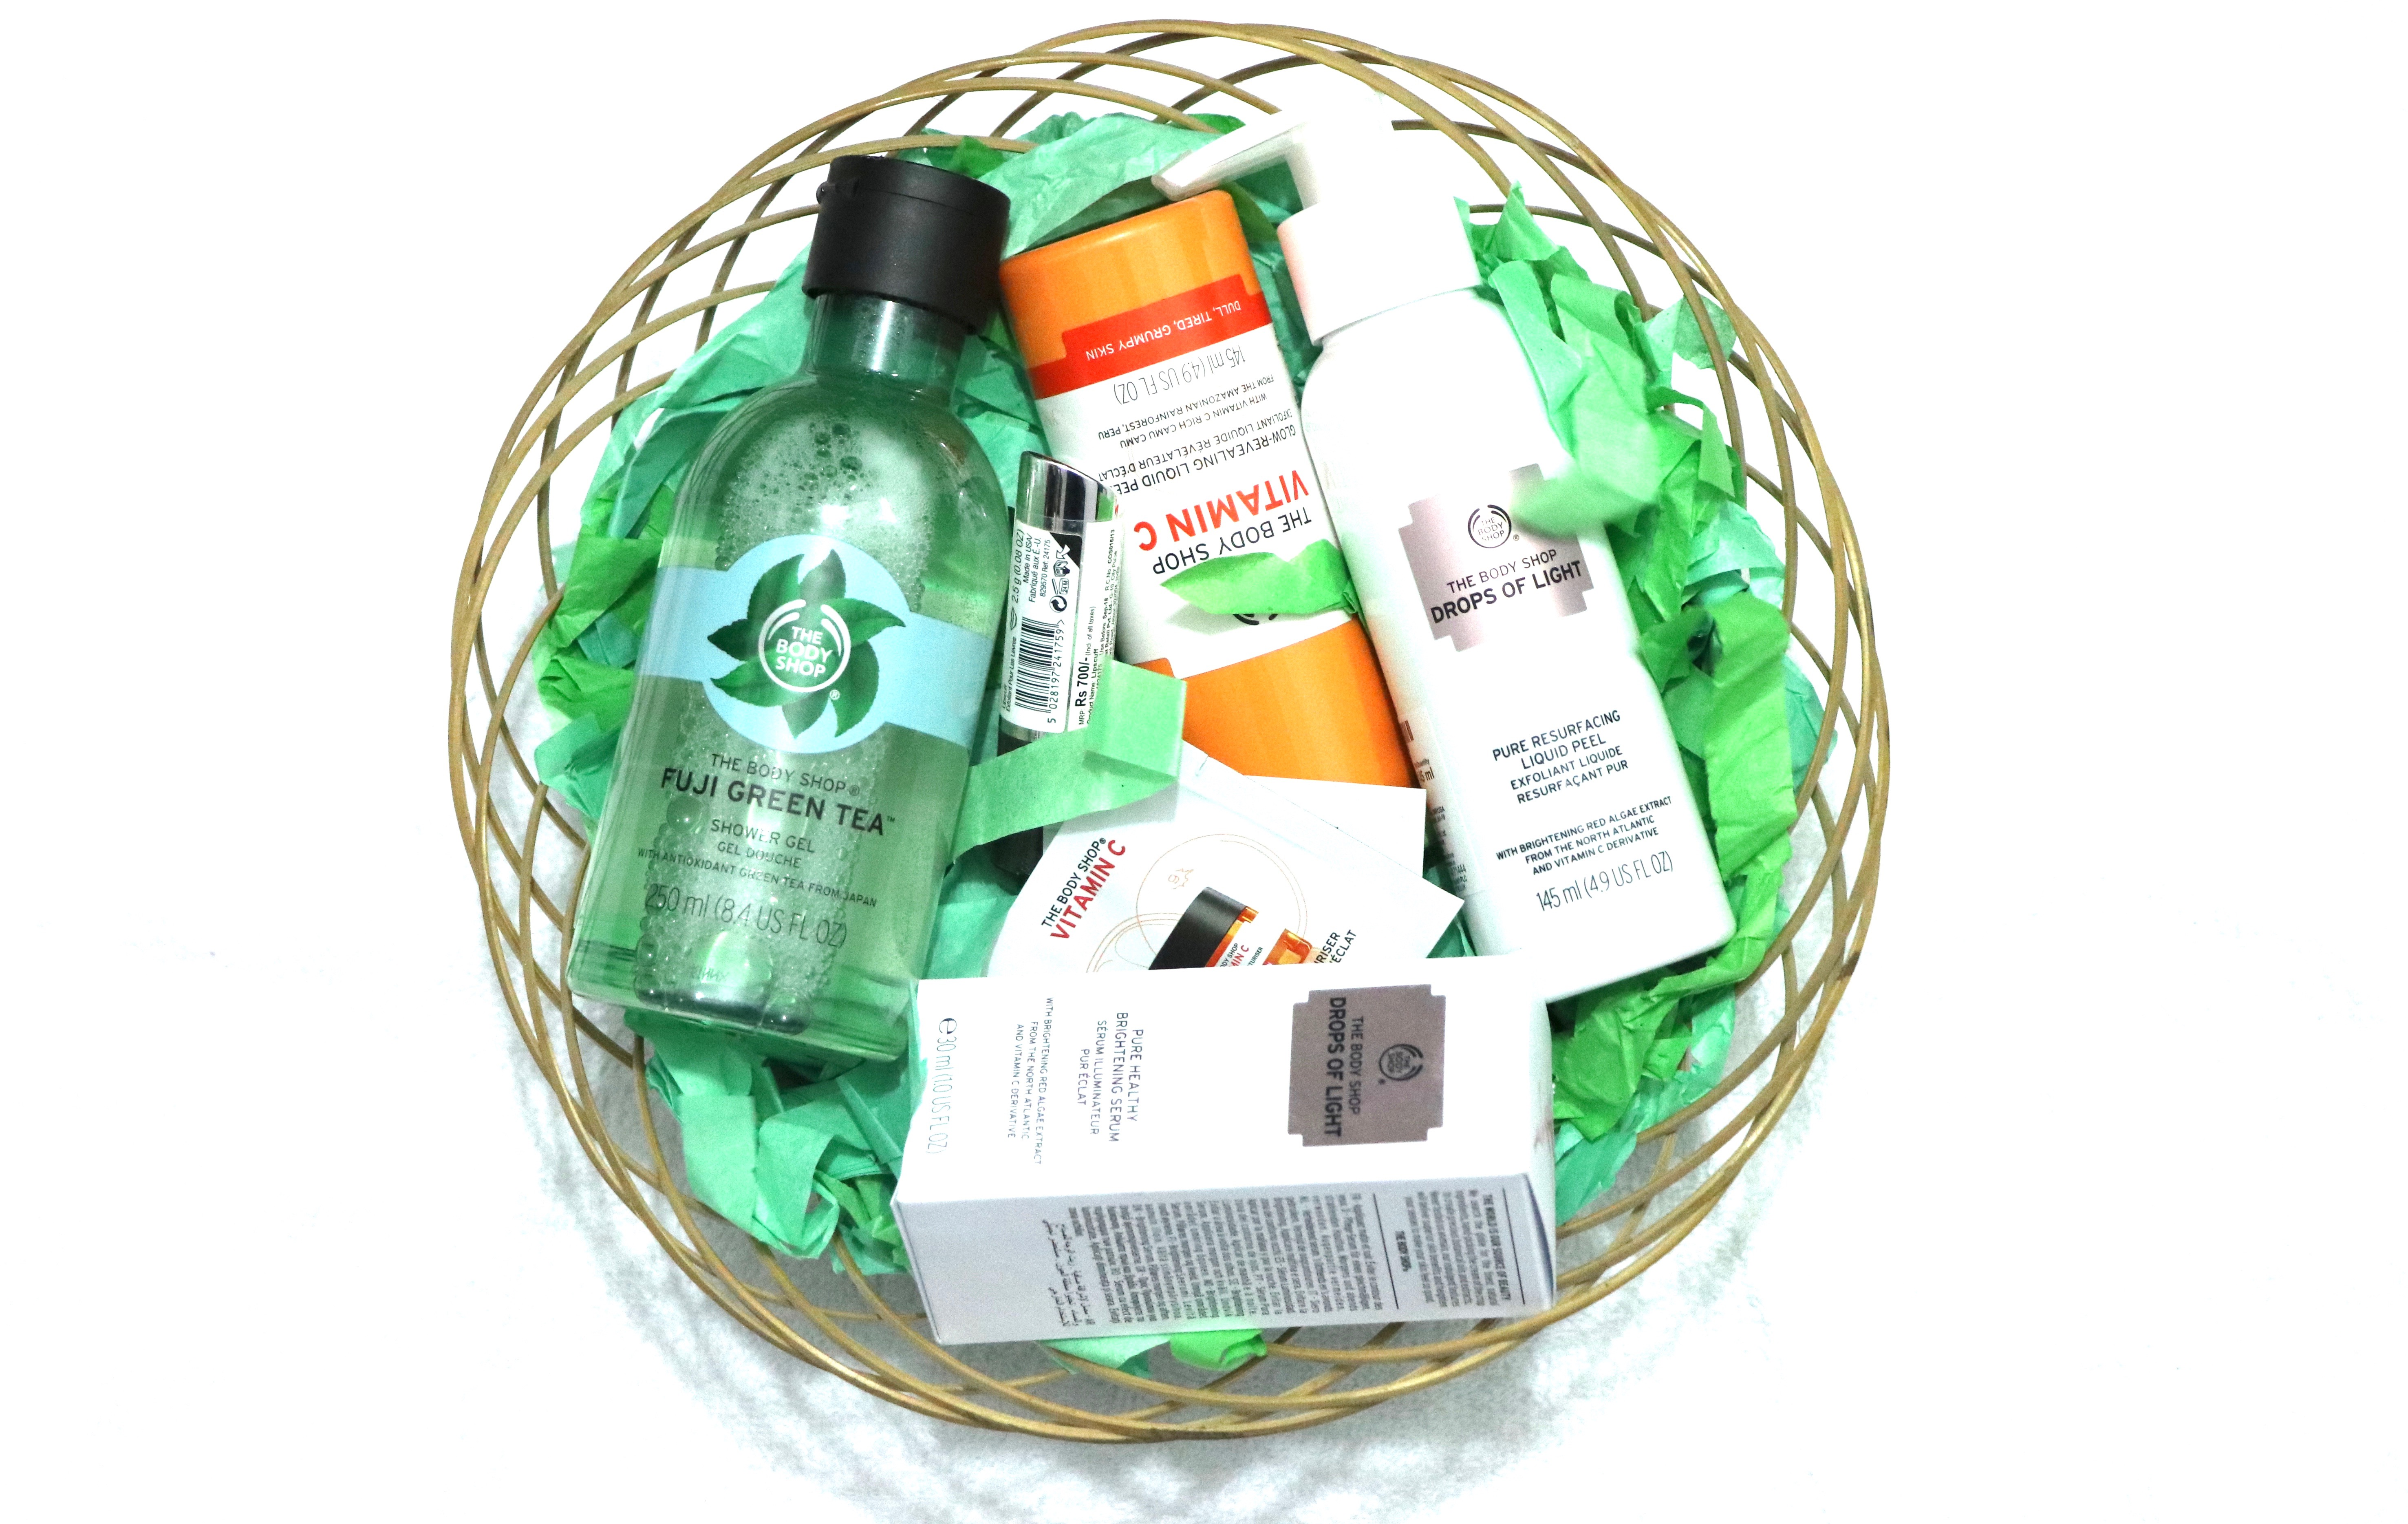 The Body Shop Haul Fuji Green Tea Shower Gel Vitamin C